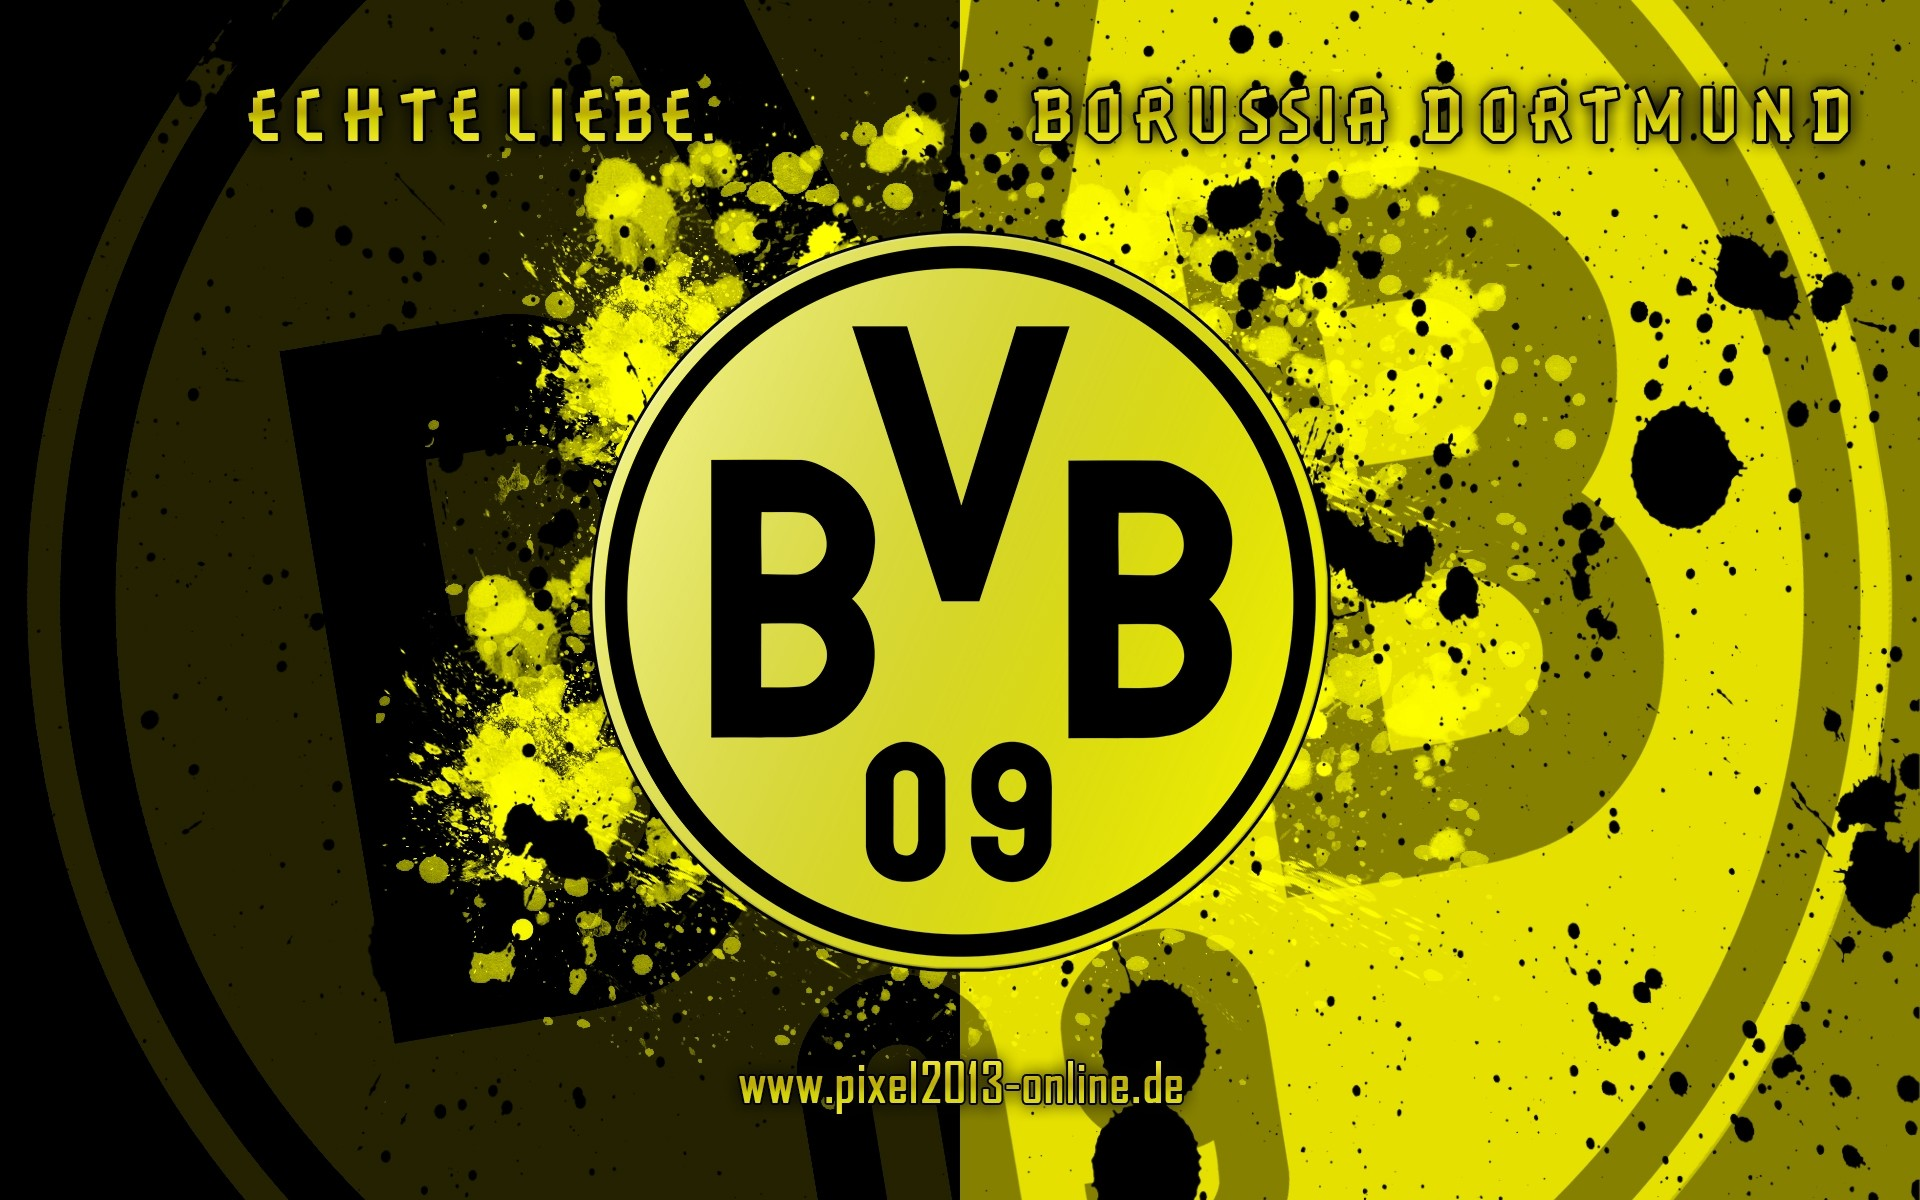 Borussia Dortmund Wallpapers 73 Images